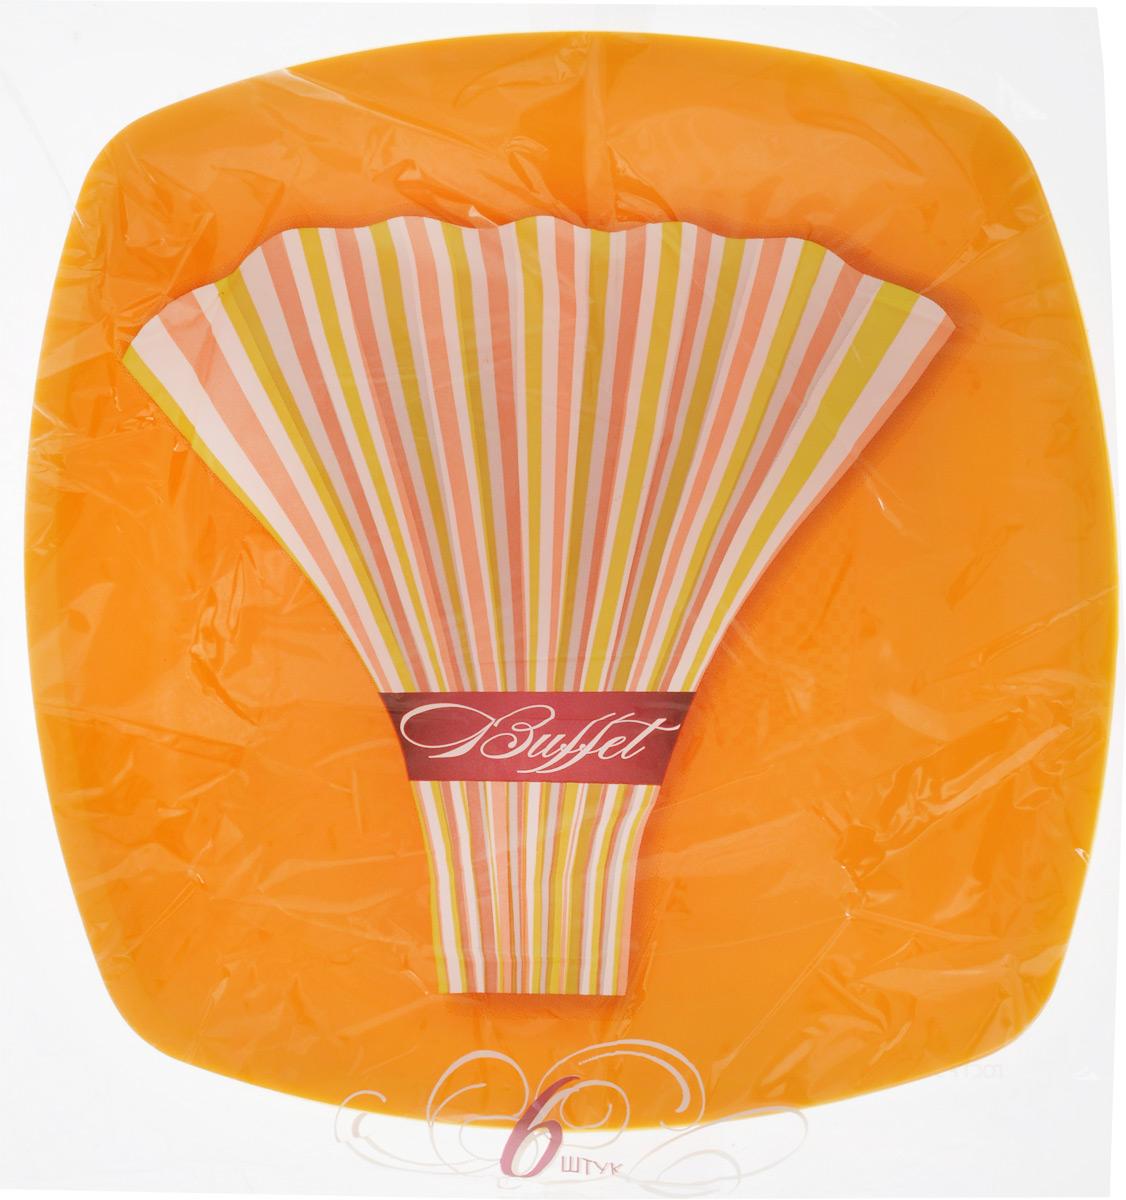 Набор одноразовых тарелок Buffet, цвет: желтый, 23 х 23 см, 6 шт набор одноразовых стаканов buffet biсolor цвет оранжевый желтый 200 мл 6 шт